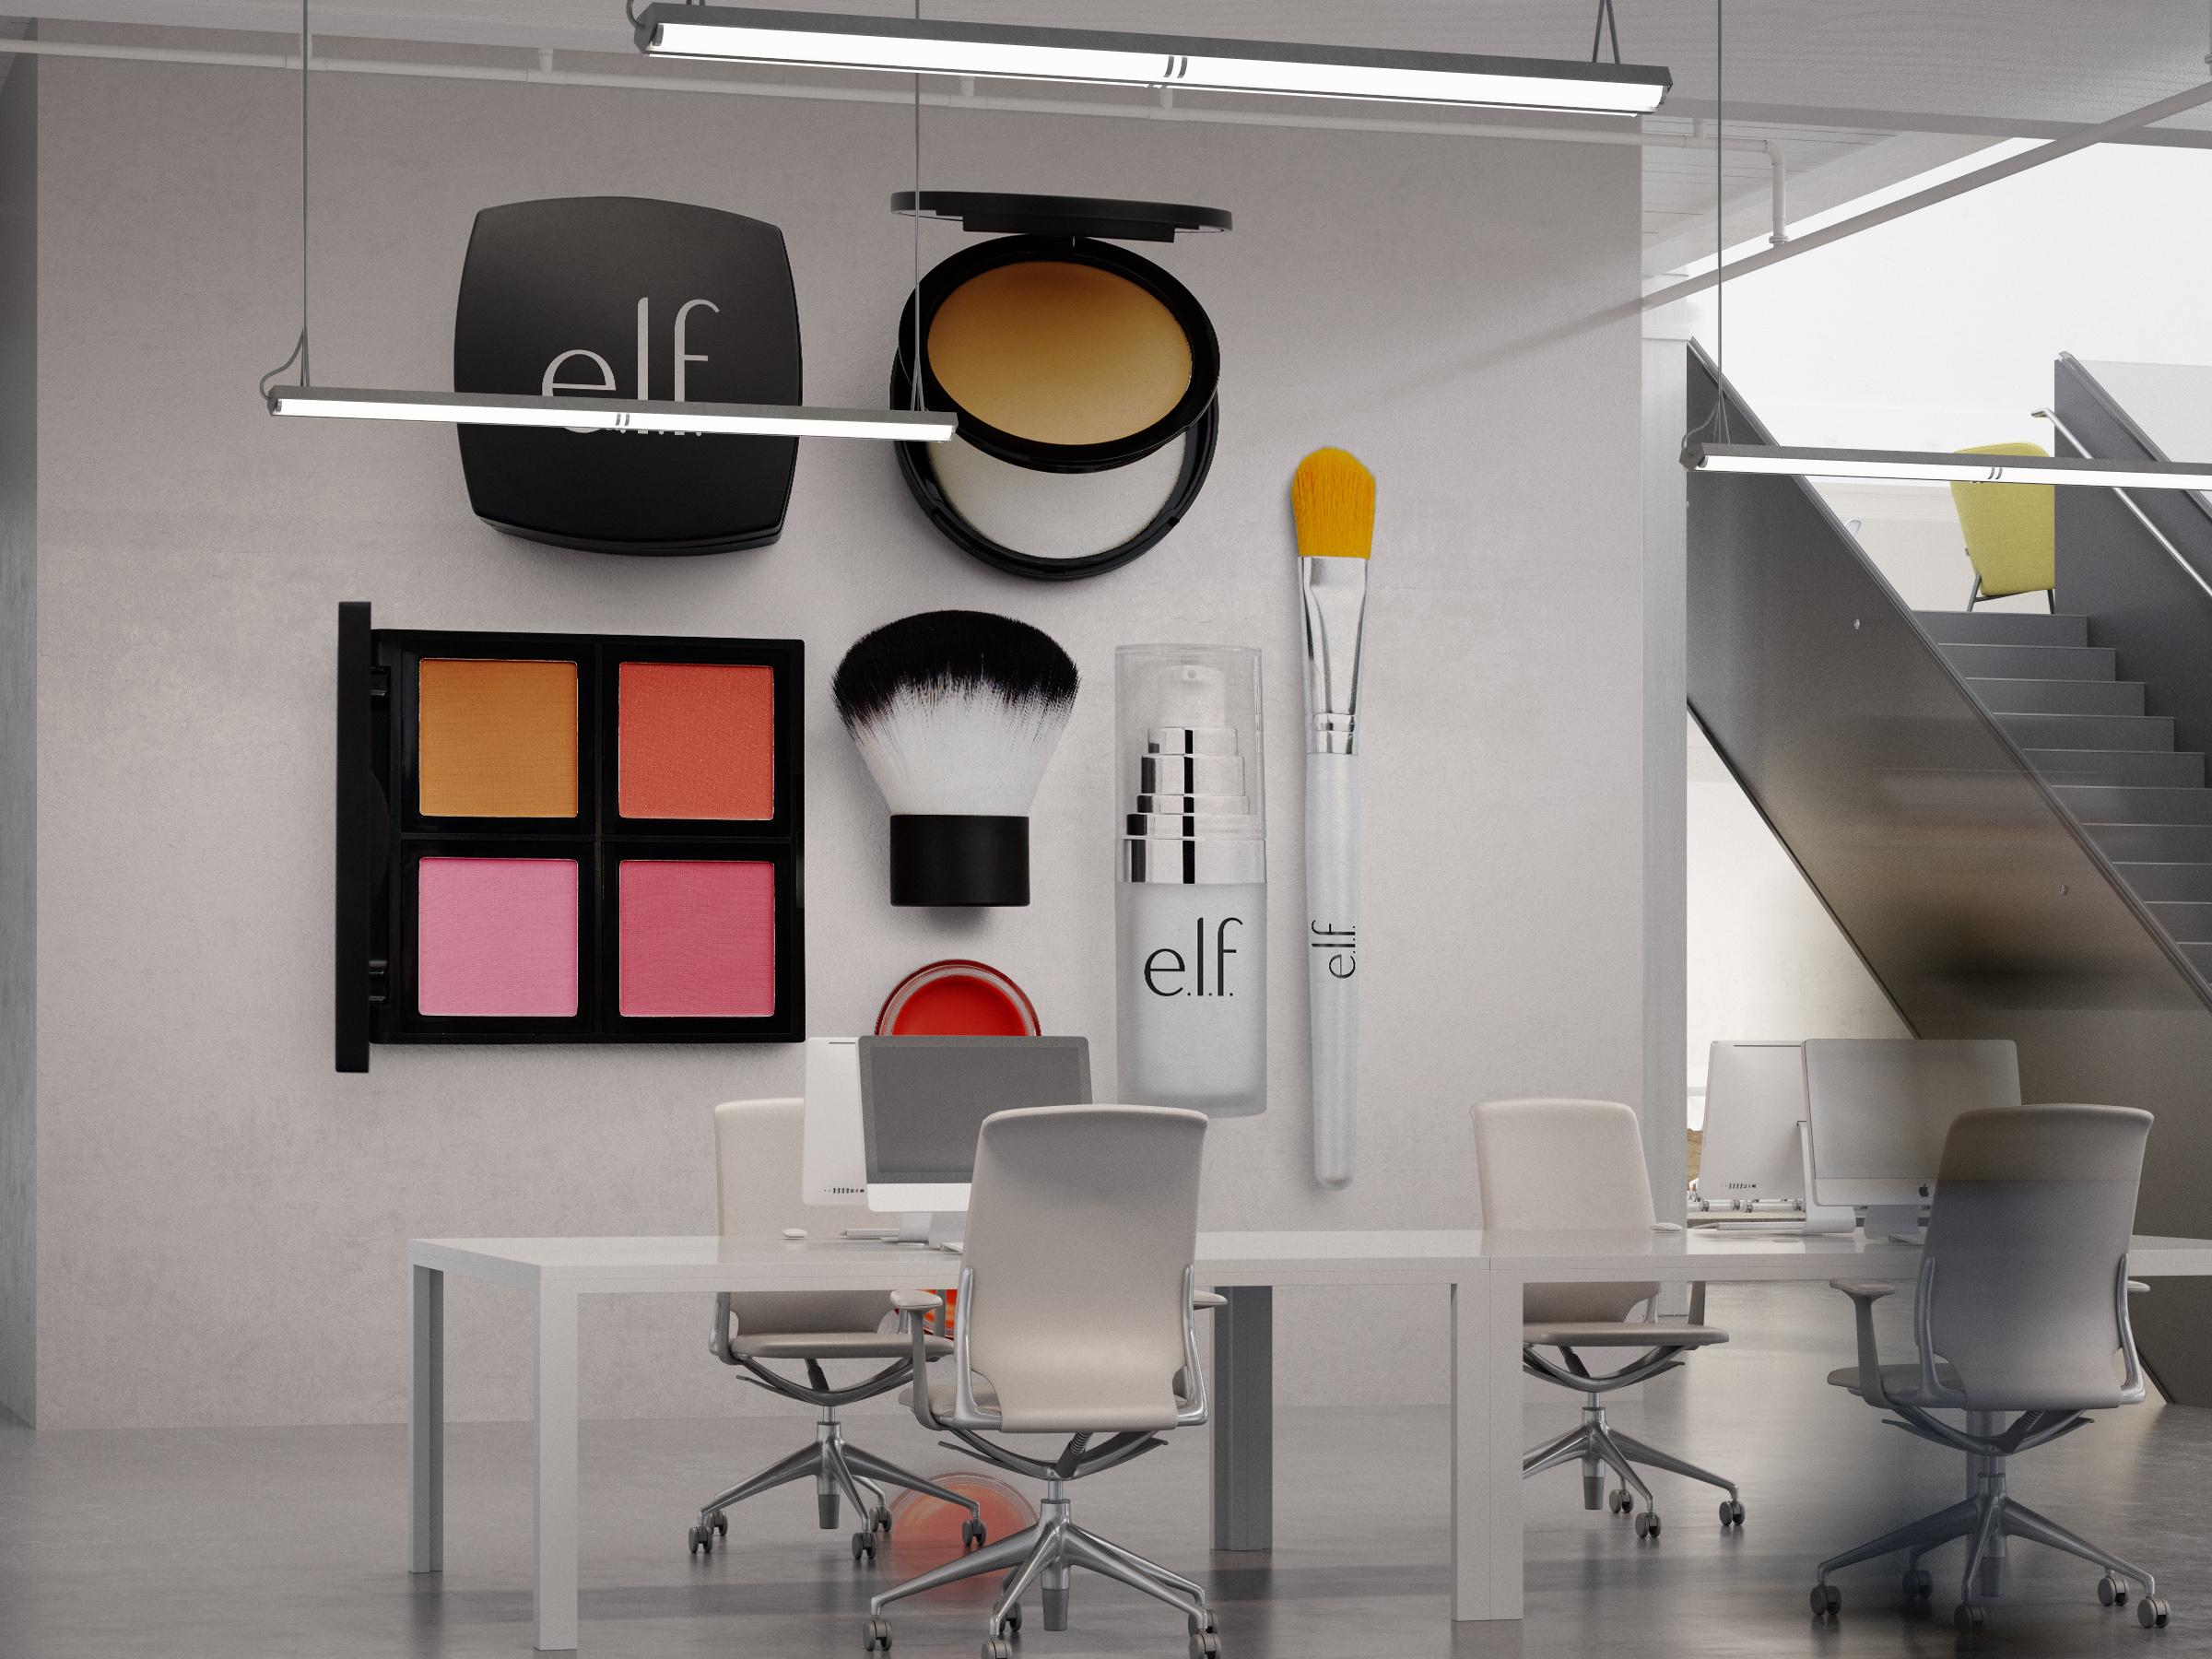 03-elf-china-office-art.jpg